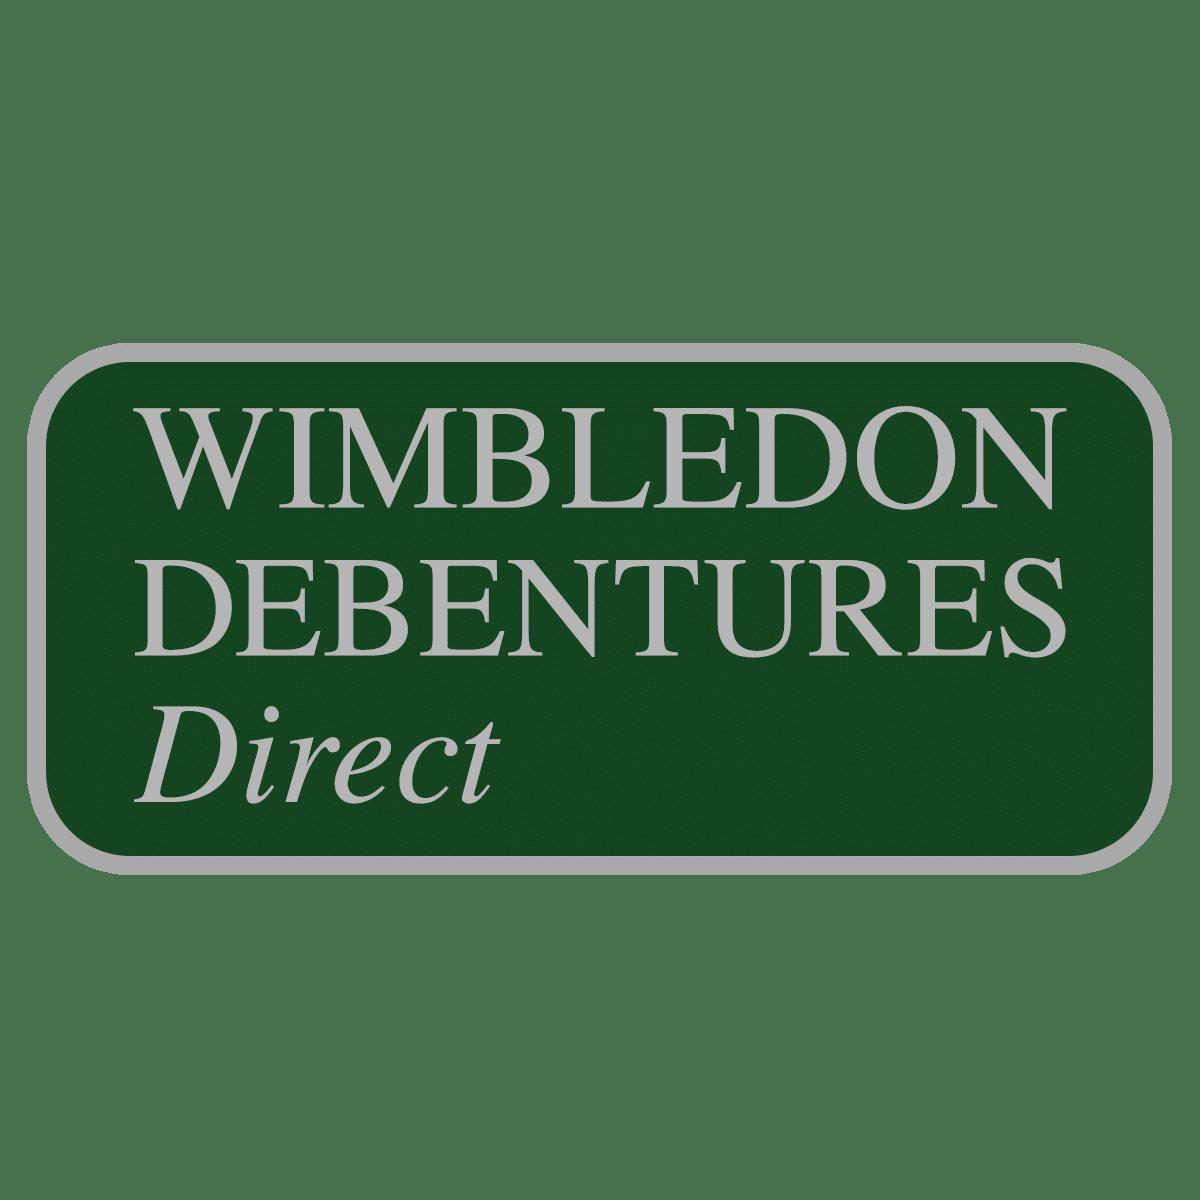 Purchase Wimbledon Debenture Tickets